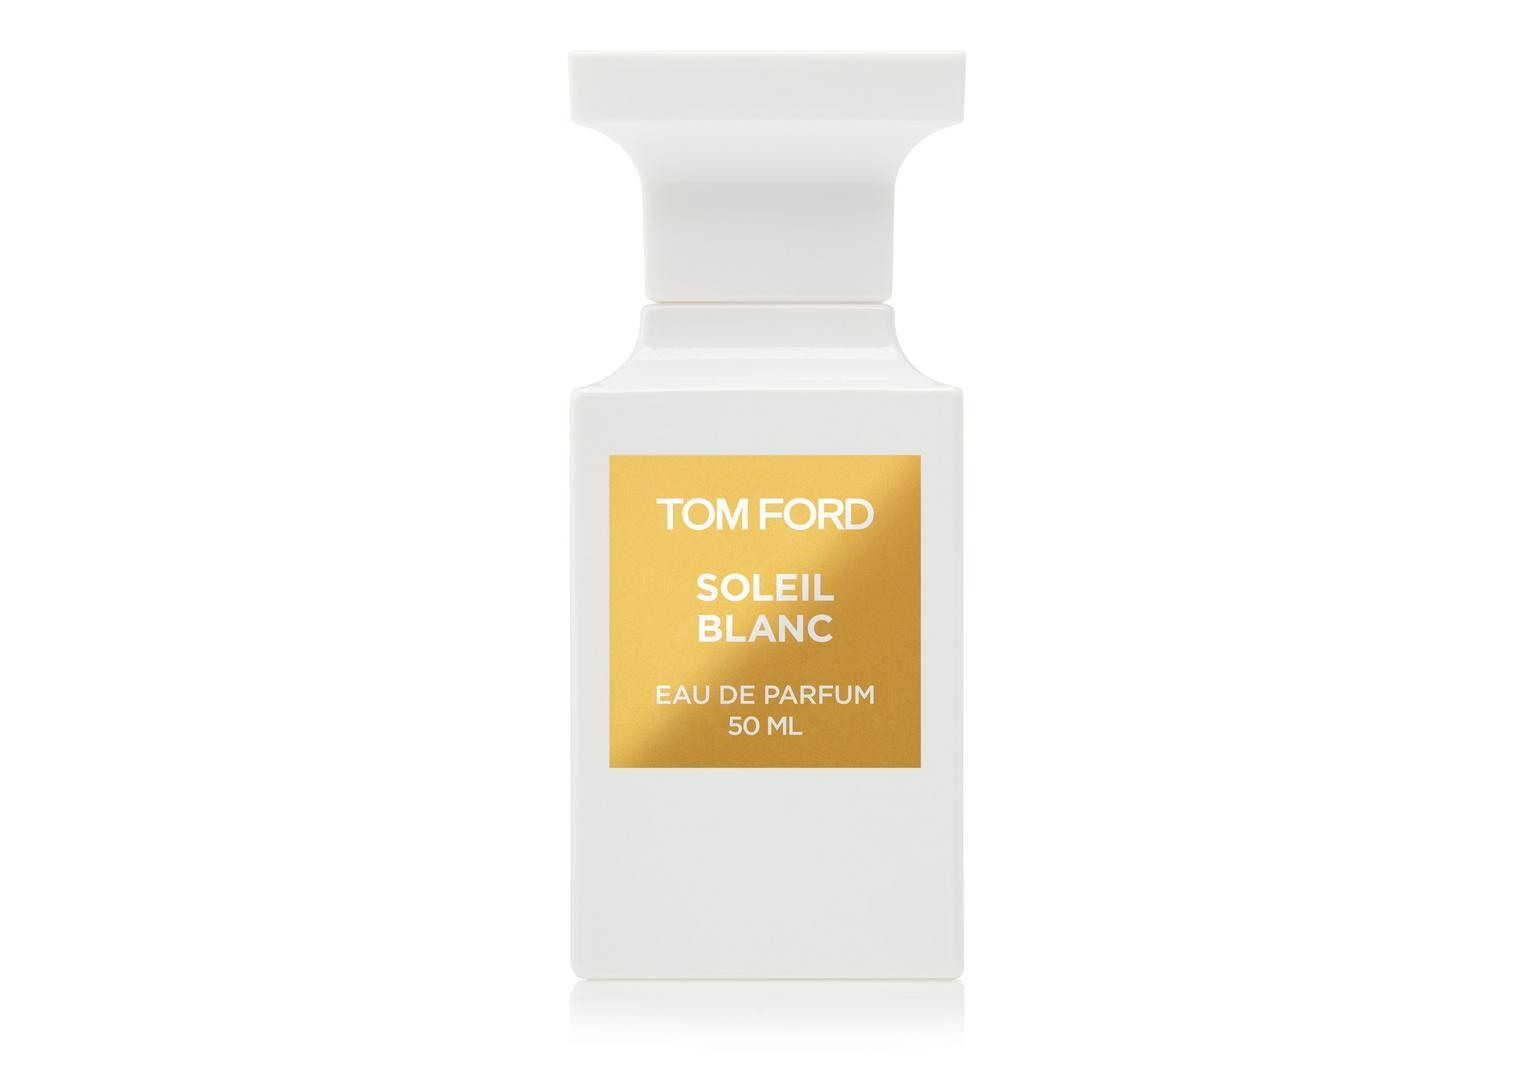 TOM FORD トムフォード ソレイユ ブラン オードパルファム50ml Soleil Blanc Eau De Parfum